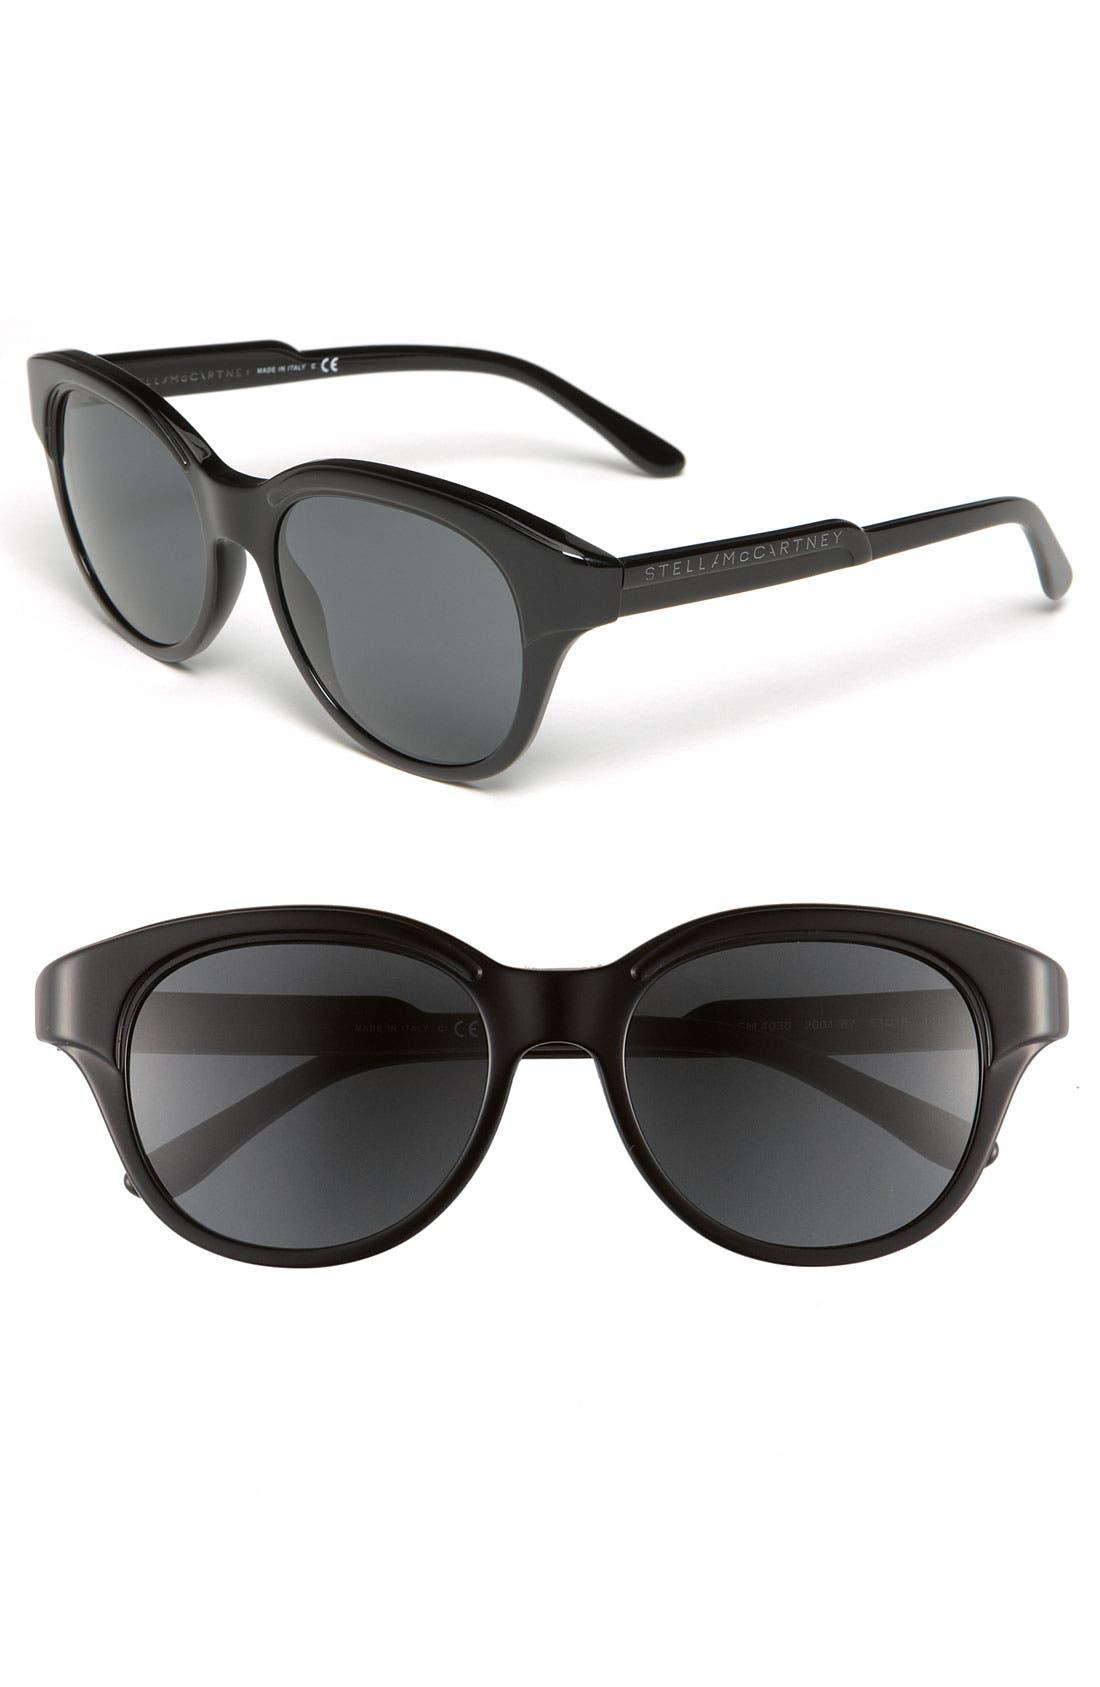 Main Image - Stella McCartney 'Small' 53mm Cat's Eye Sunglasses